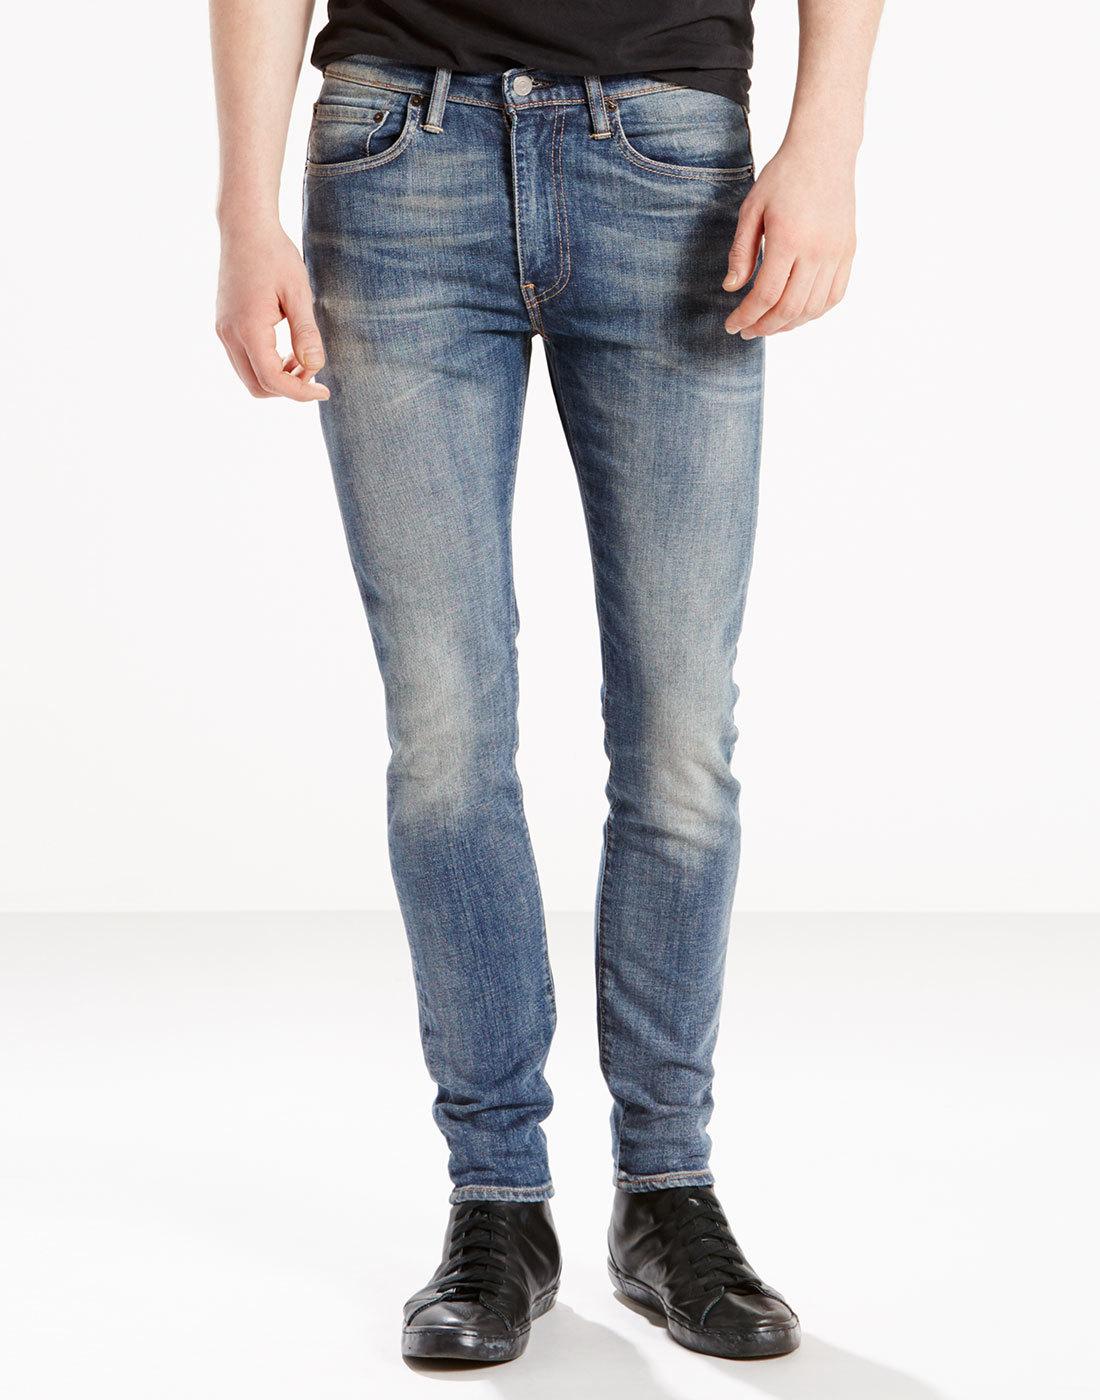 LEVI'S® 519 Retro Extreme Skinny Jeans WILDERNESS